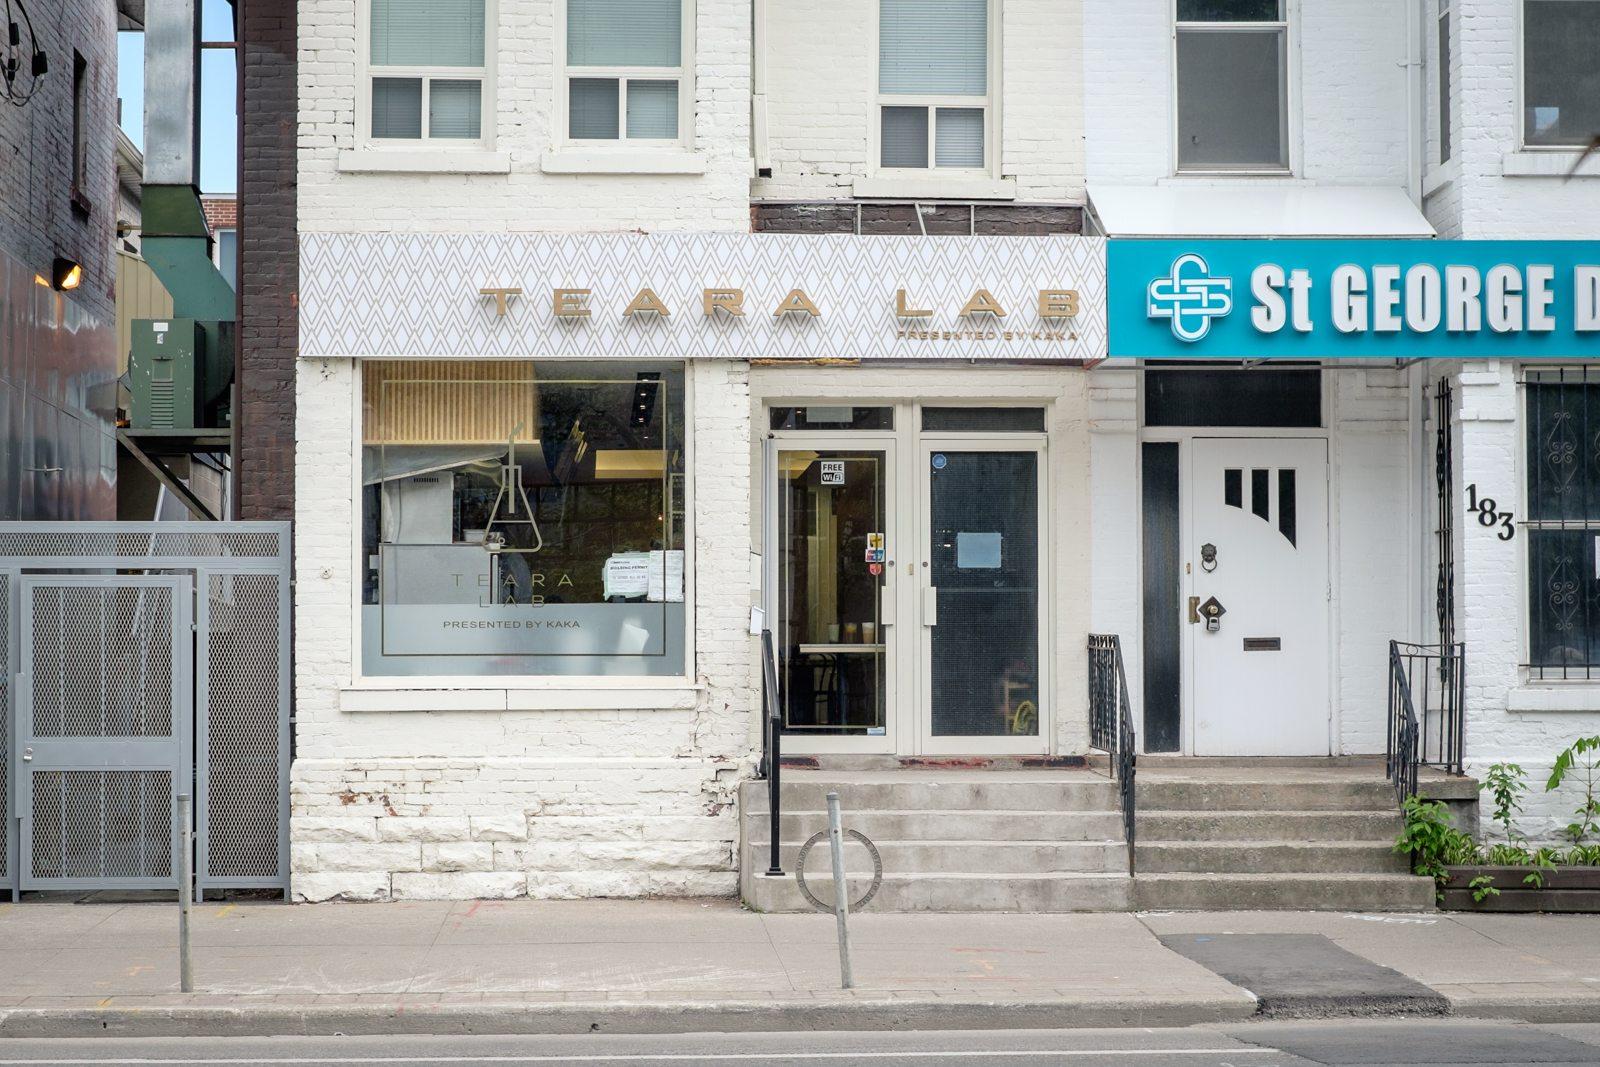 toronto-restaurants-teara-lab-japanese-sandwiches-university-exterior